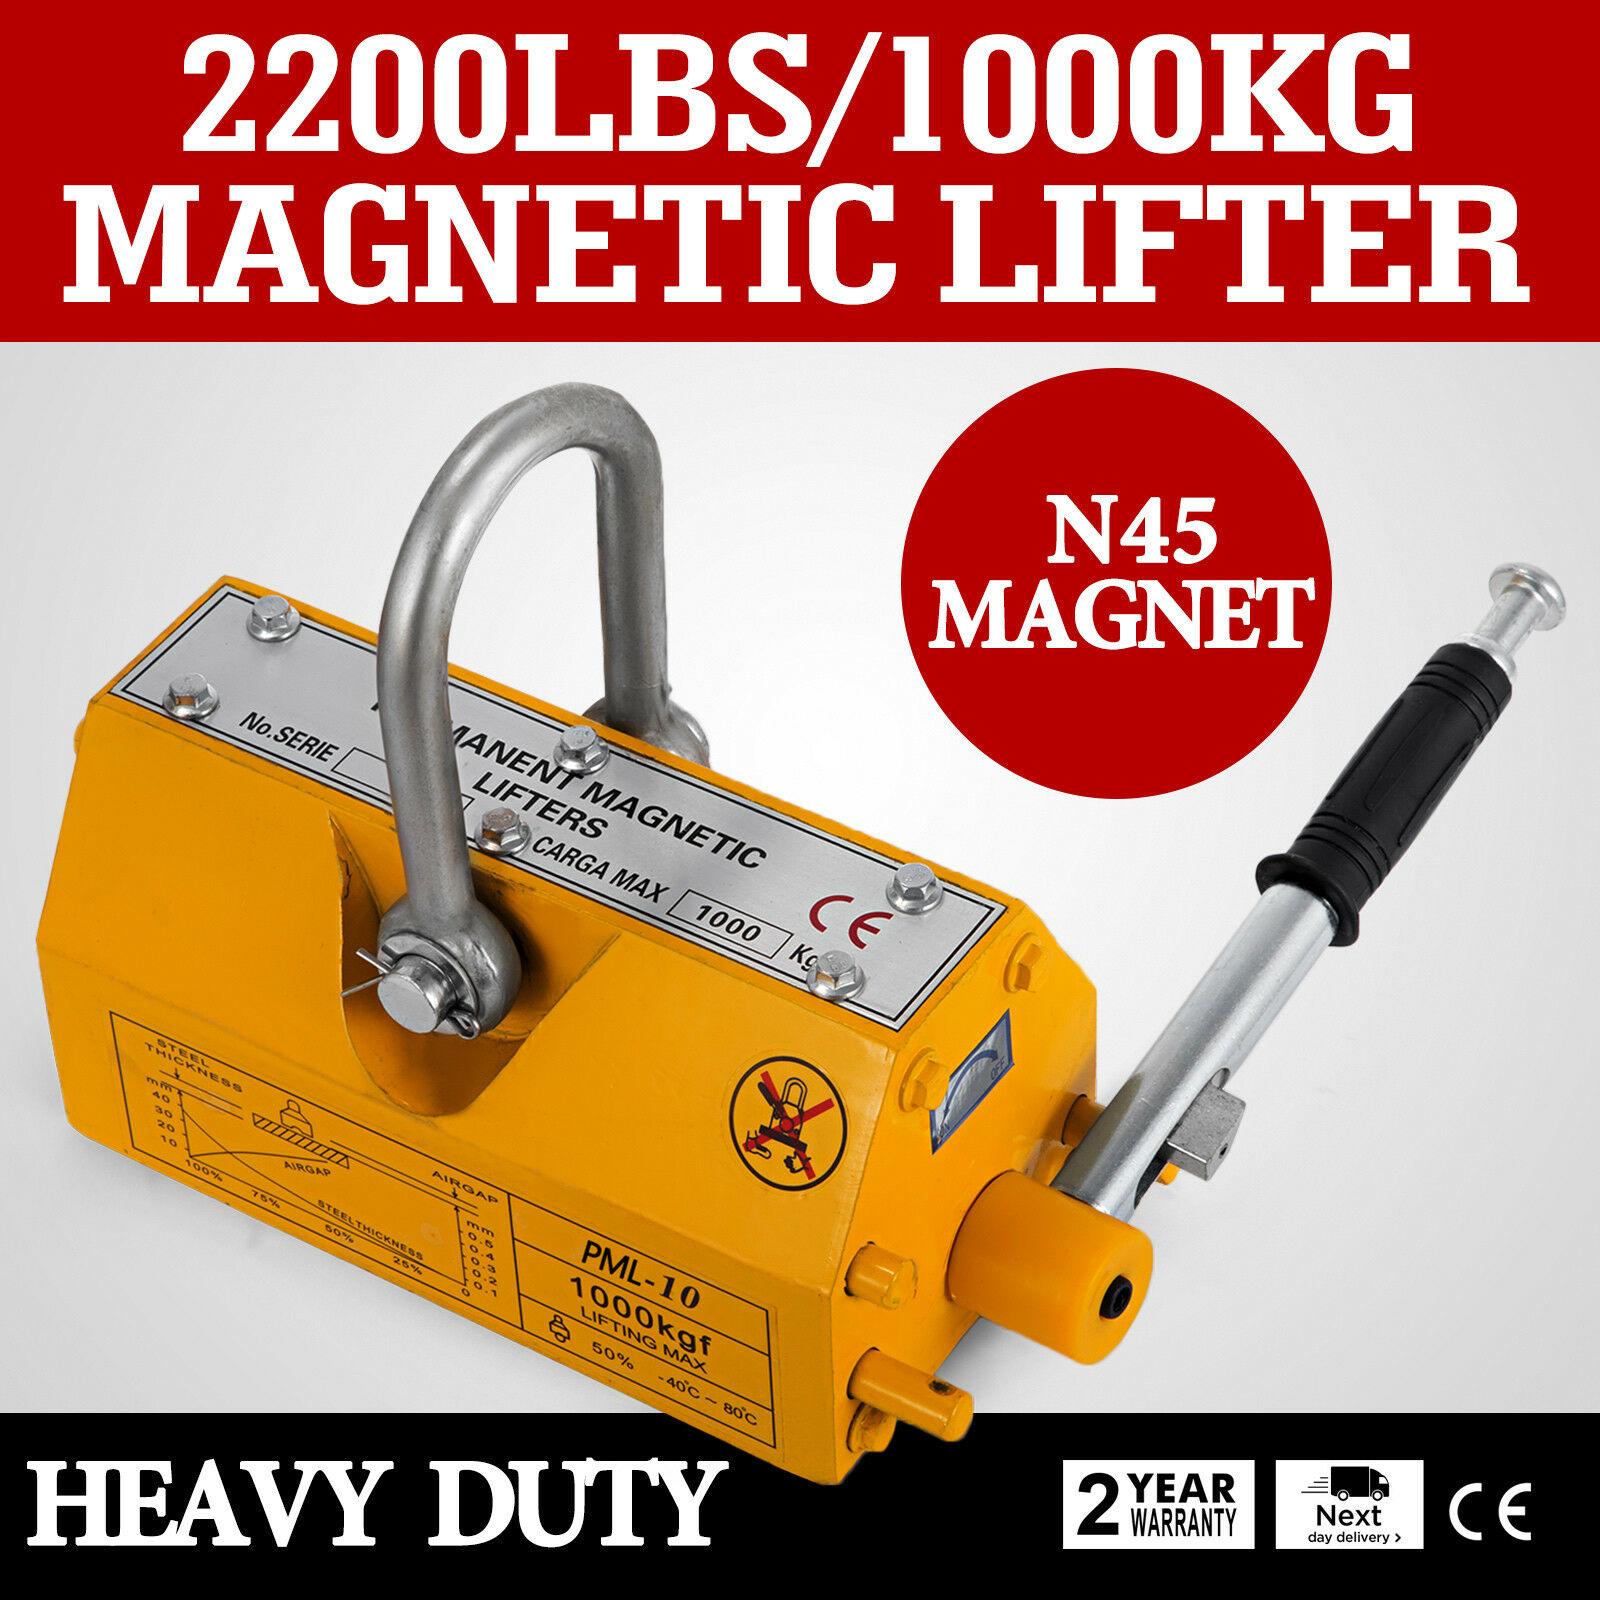 1000KG / 2200LBS Steel Magnetic Lifter Heavy Duty Crane Hoist Lifting Magnet